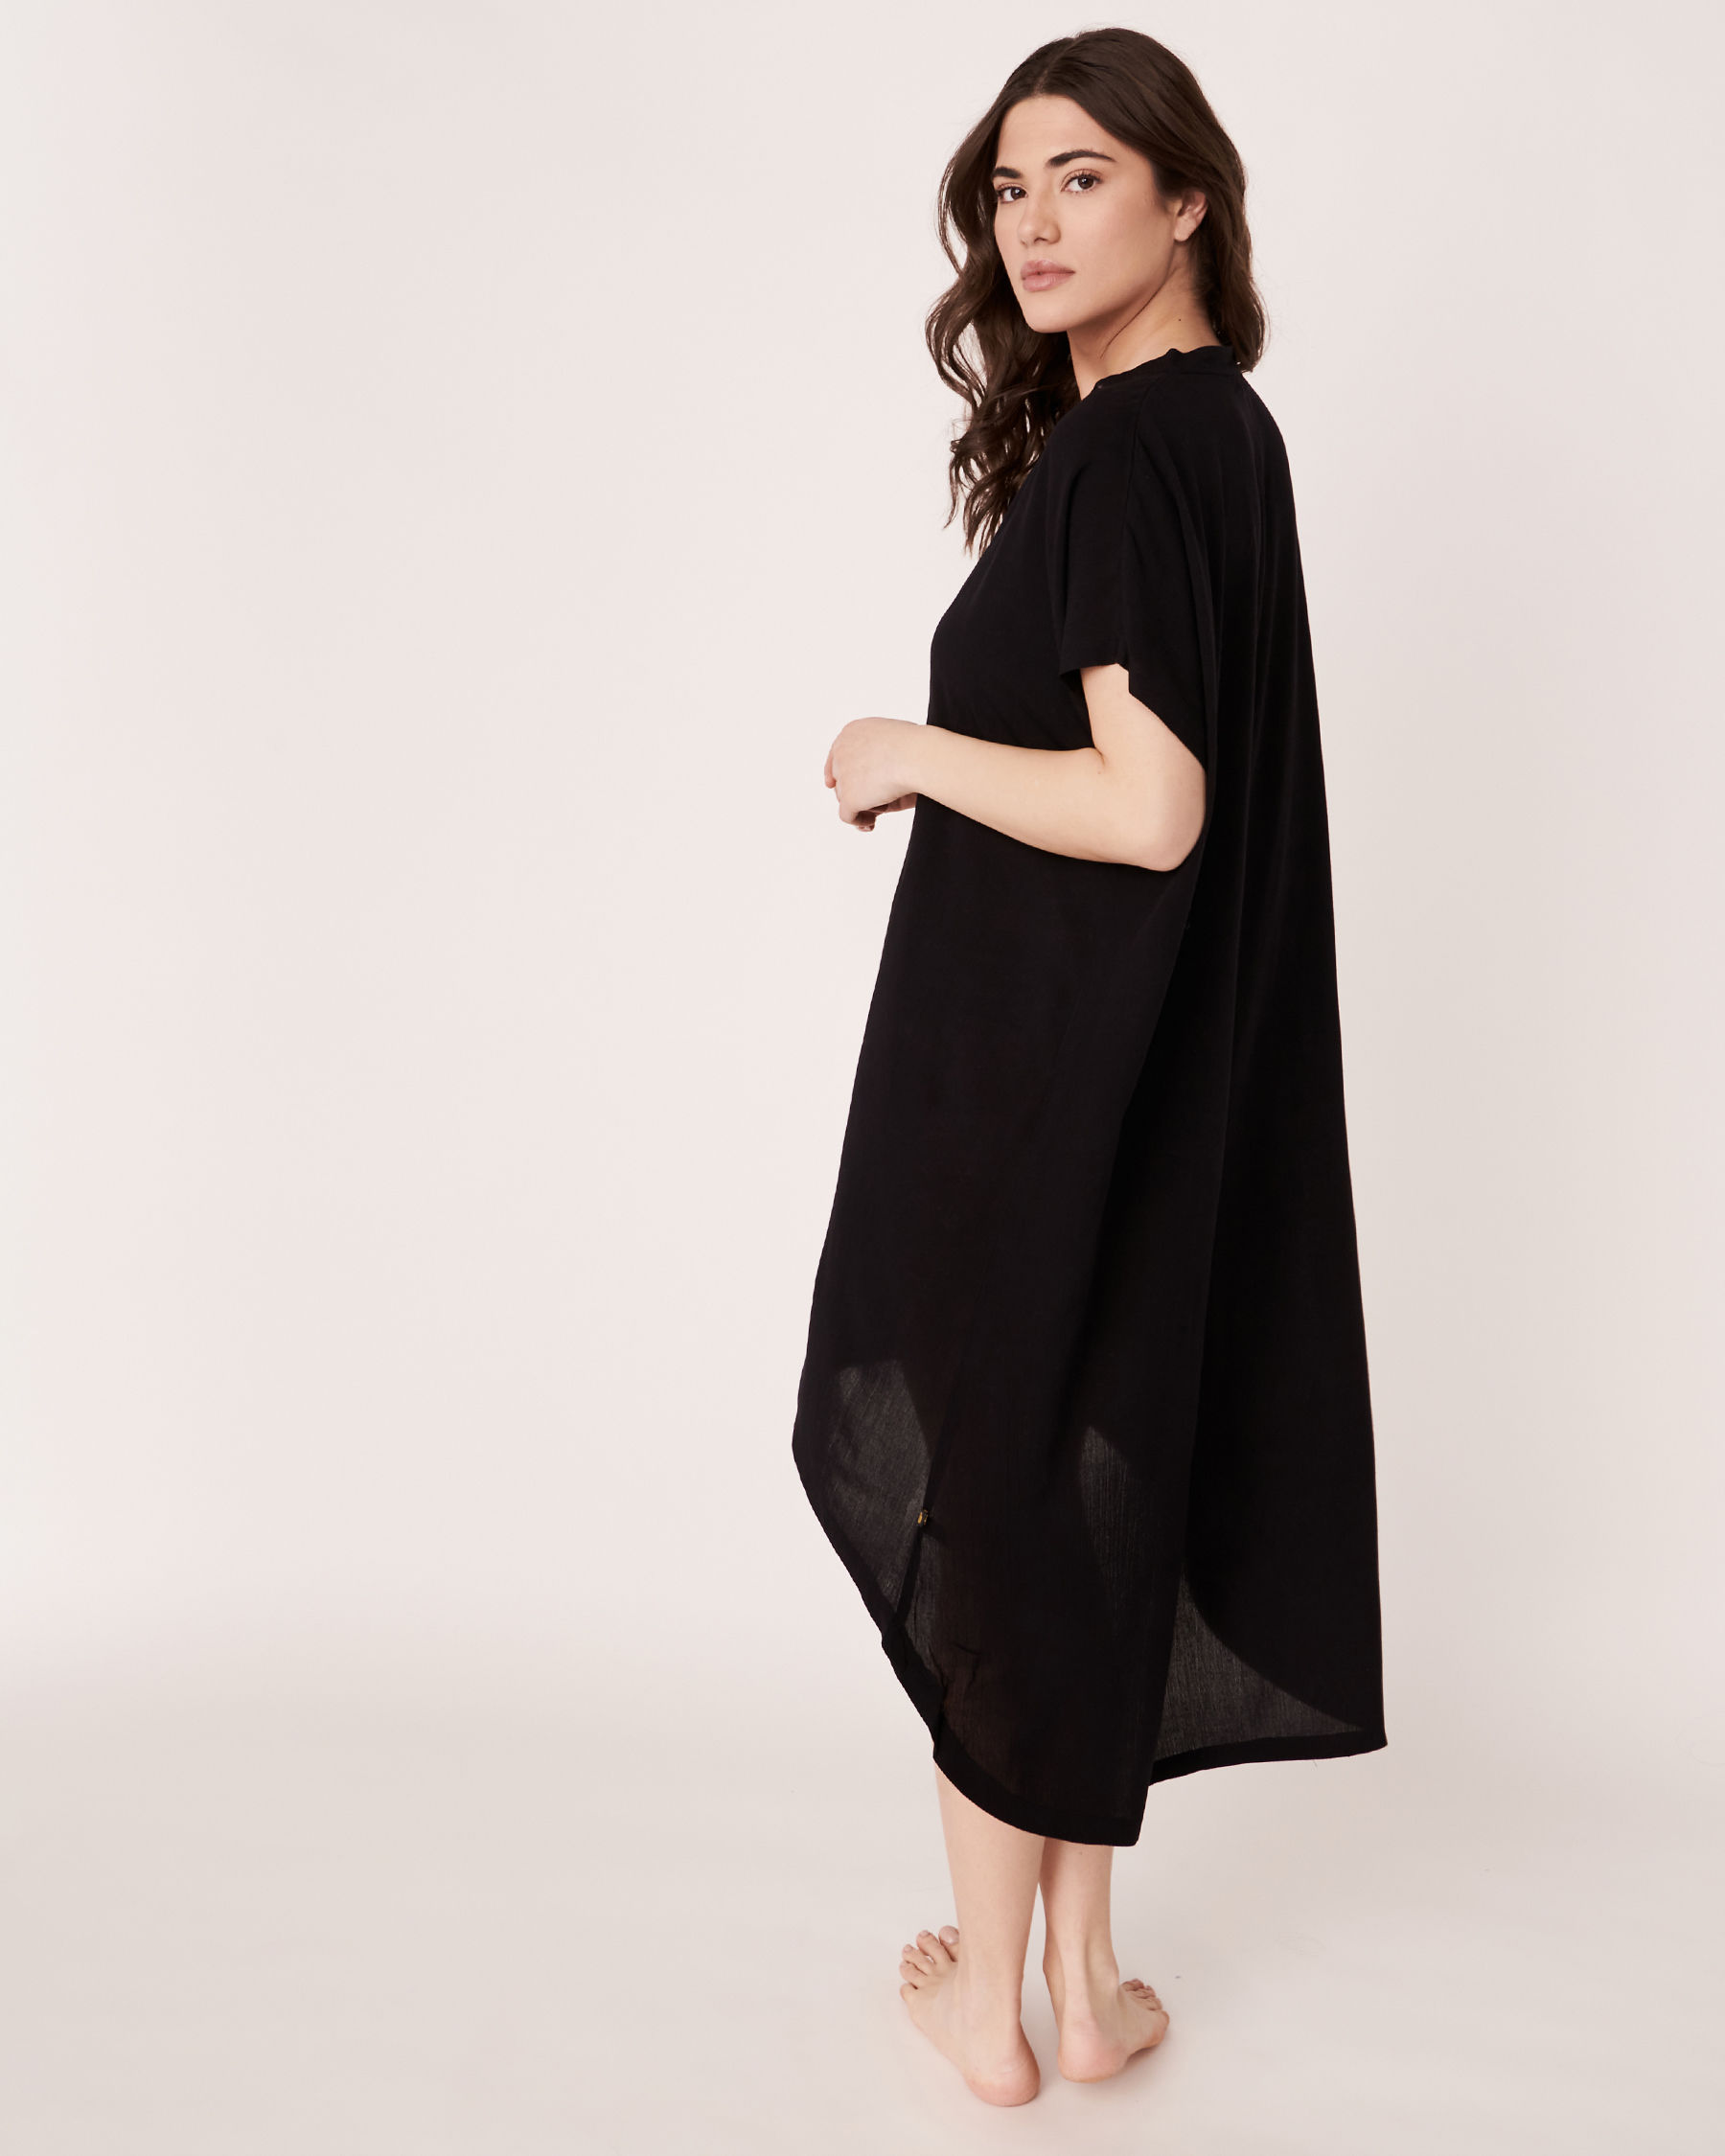 LA VIE EN ROSE AQUA High and Low Dress Black 80300012 - View2